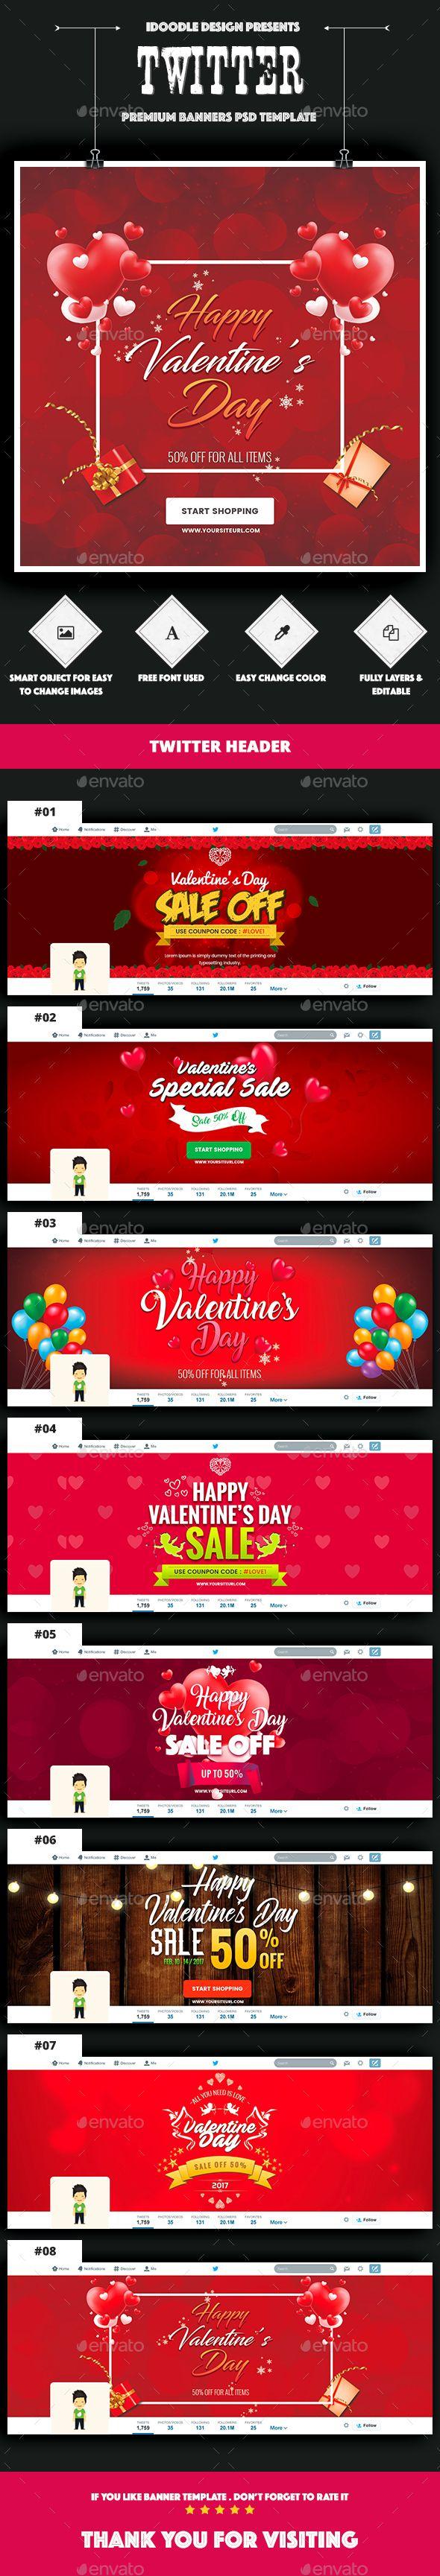 Twitter Header Valentine\'s Day - 08 PSD | Header, Psd templates and ...